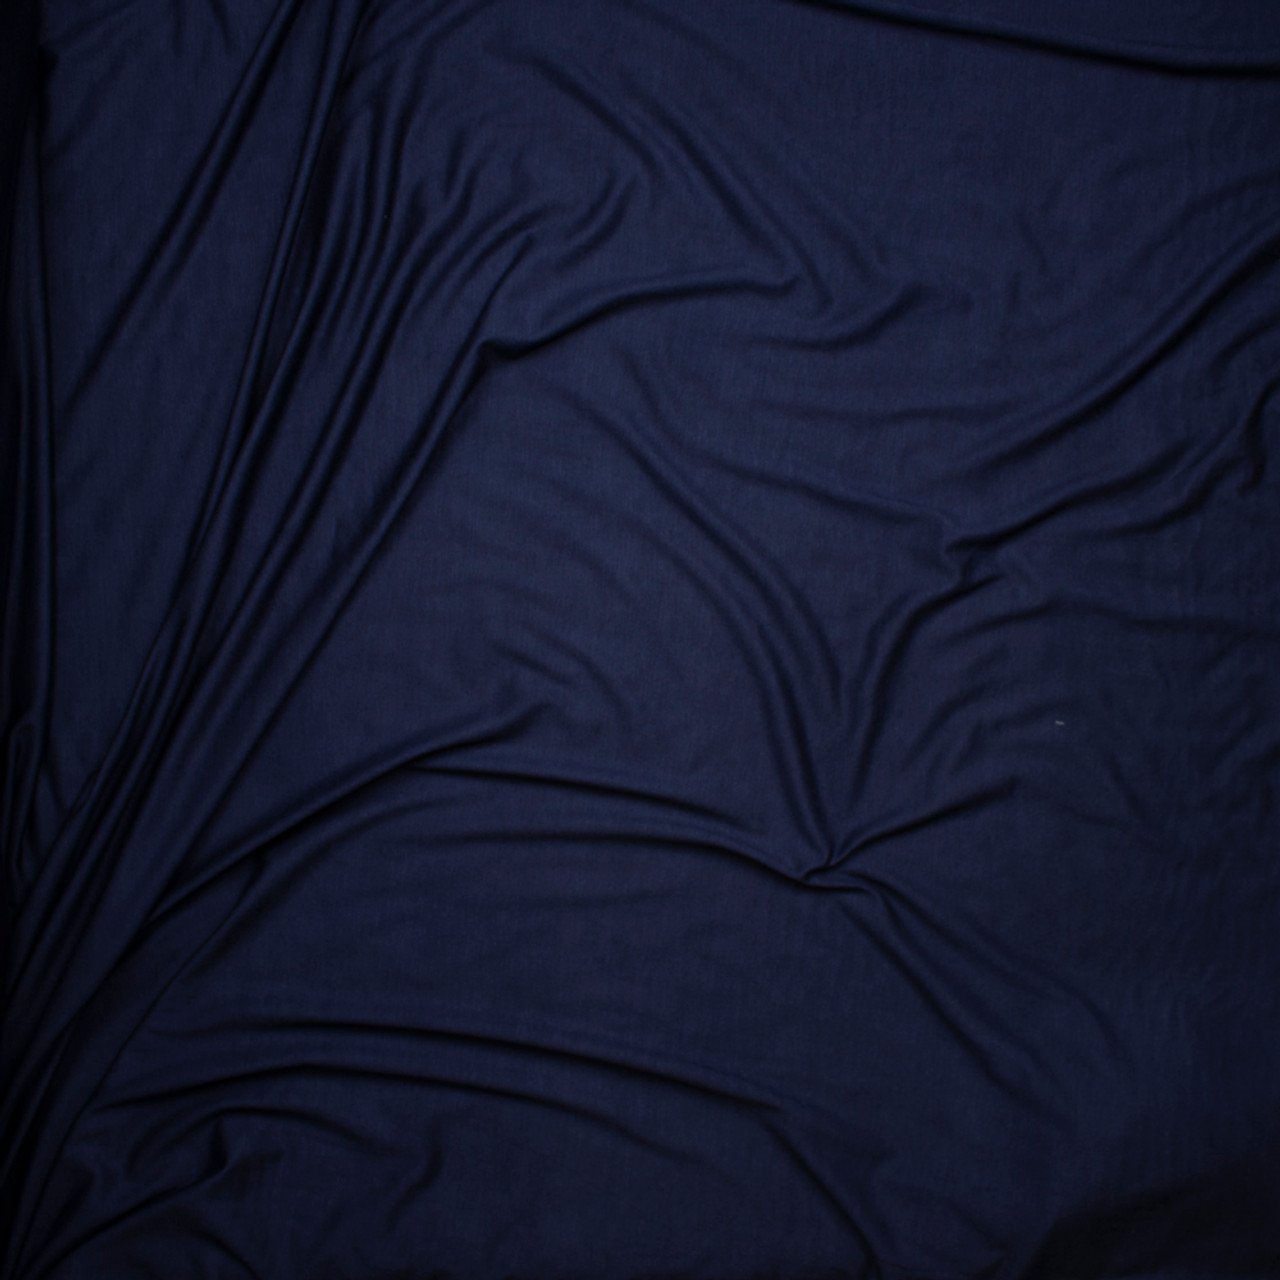 EM-4087MA-Navy-M Viscose Jersey Knit Fabric